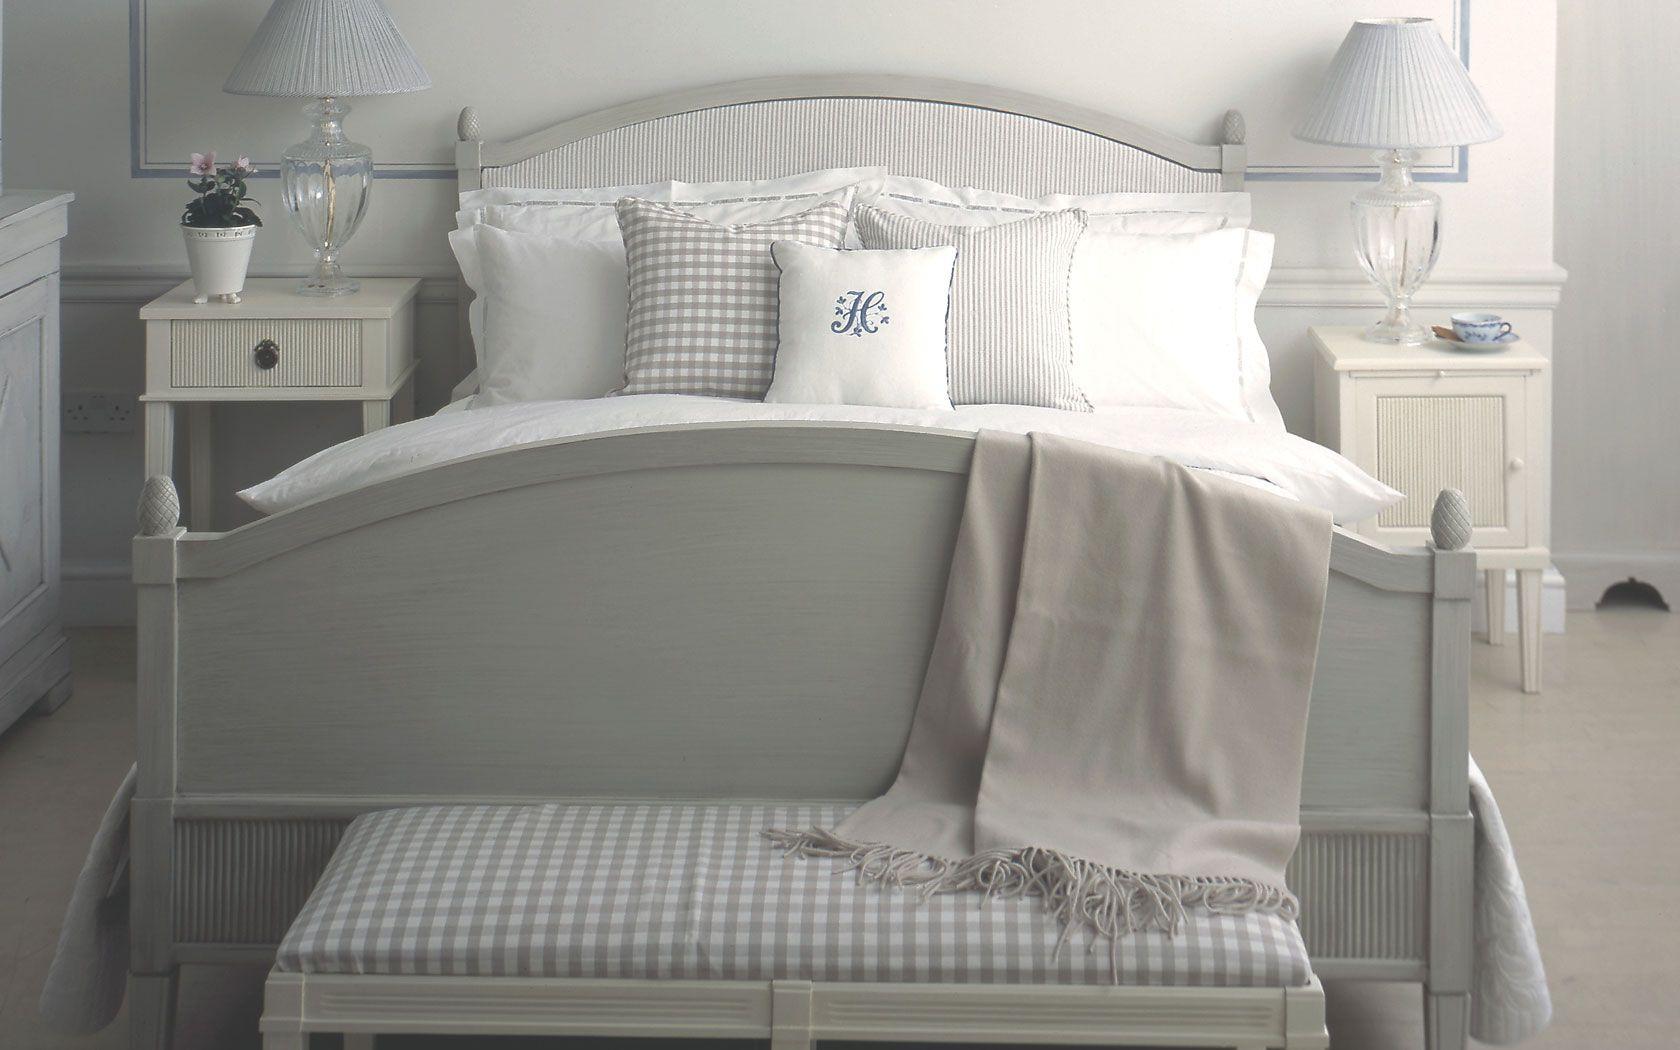 Gustavian Style Bedroom Furniture Google Search Guest Room - Gustavian bedroom furniture